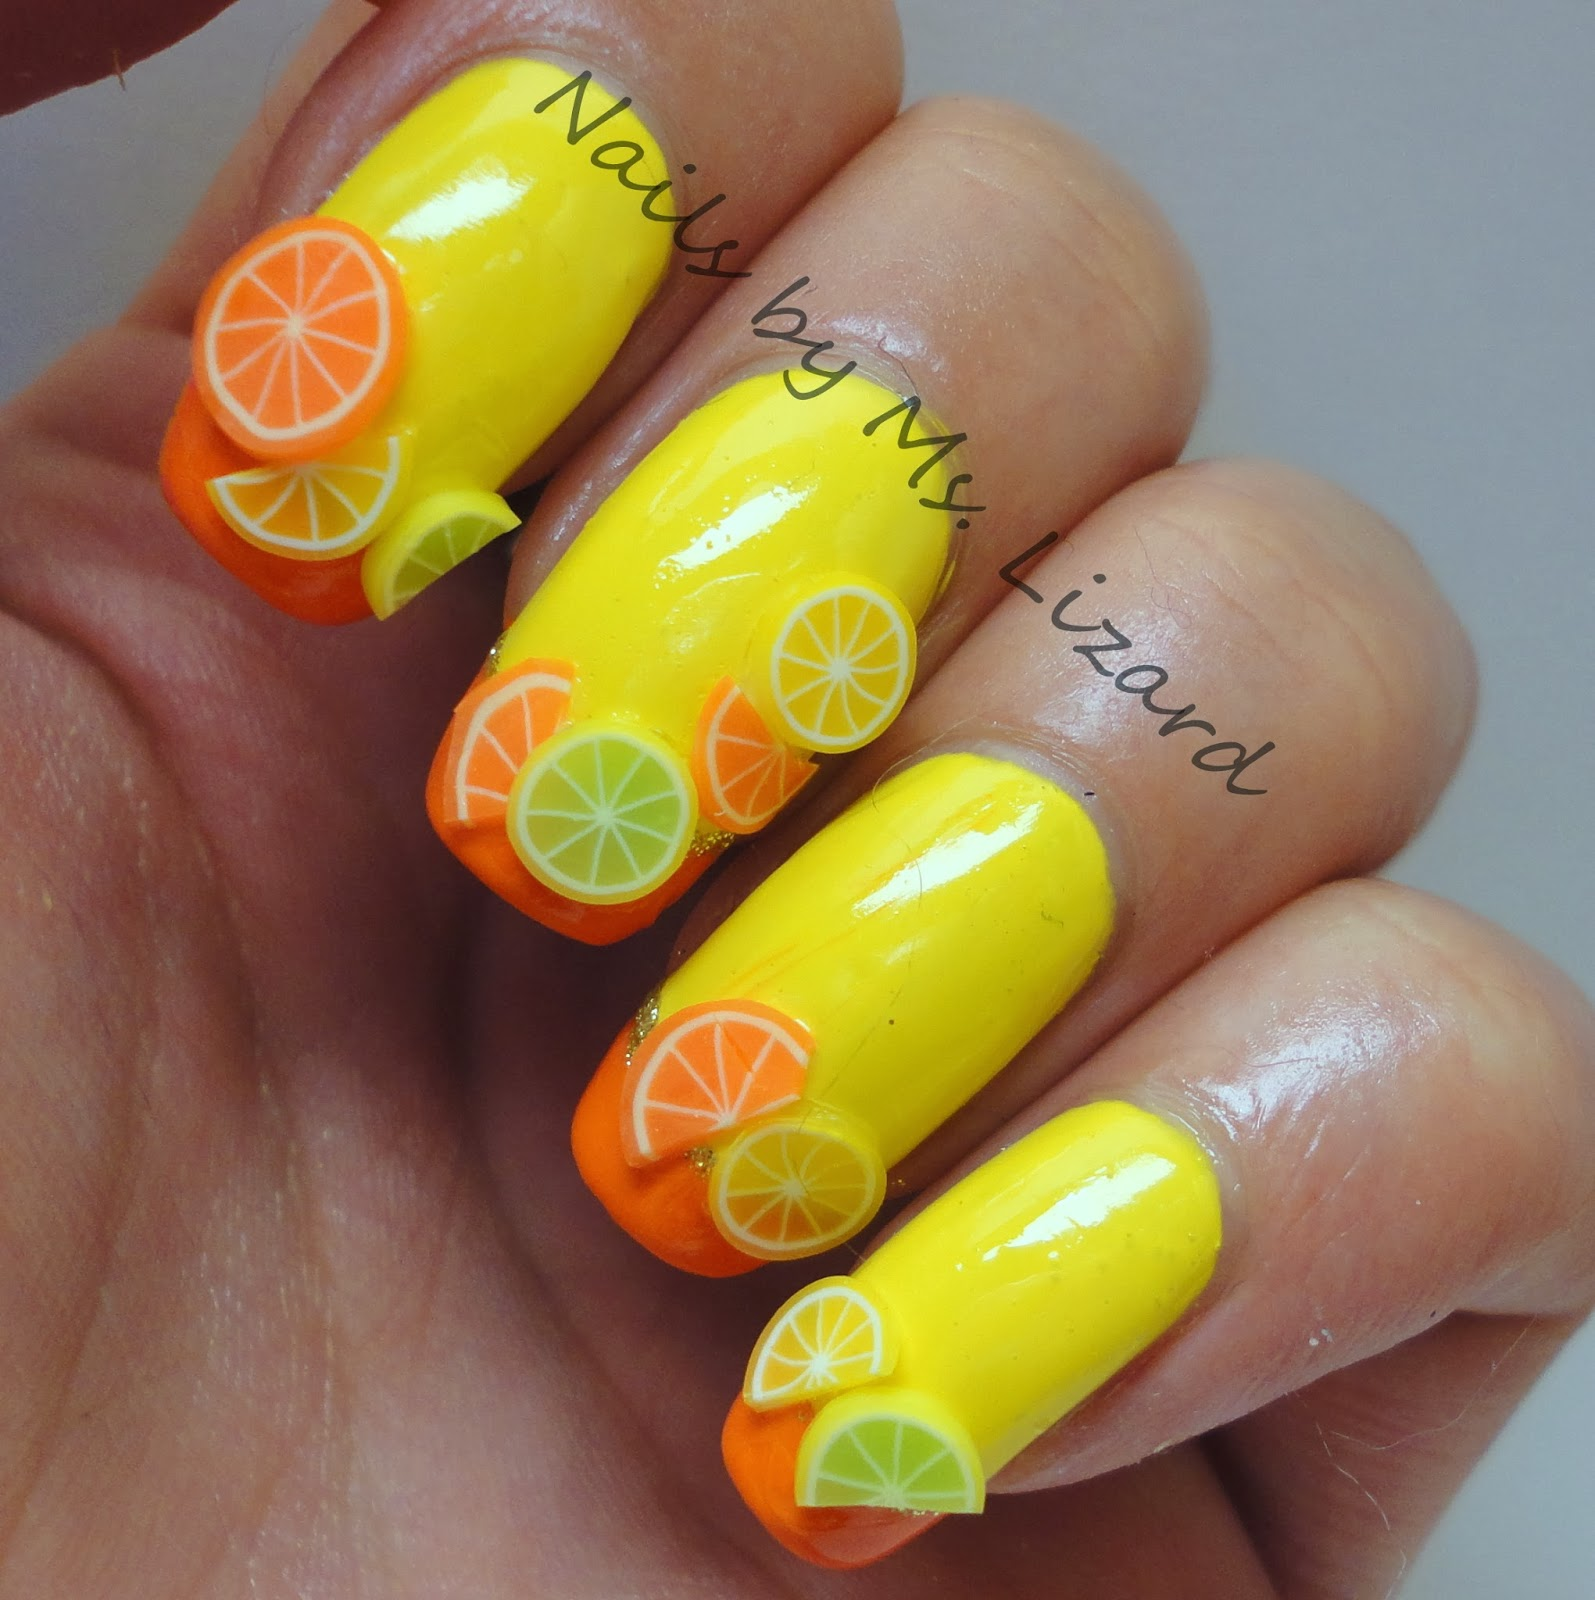 Fimo Fruit Nail Art | www.imgkid.com - The Image Kid Has It!